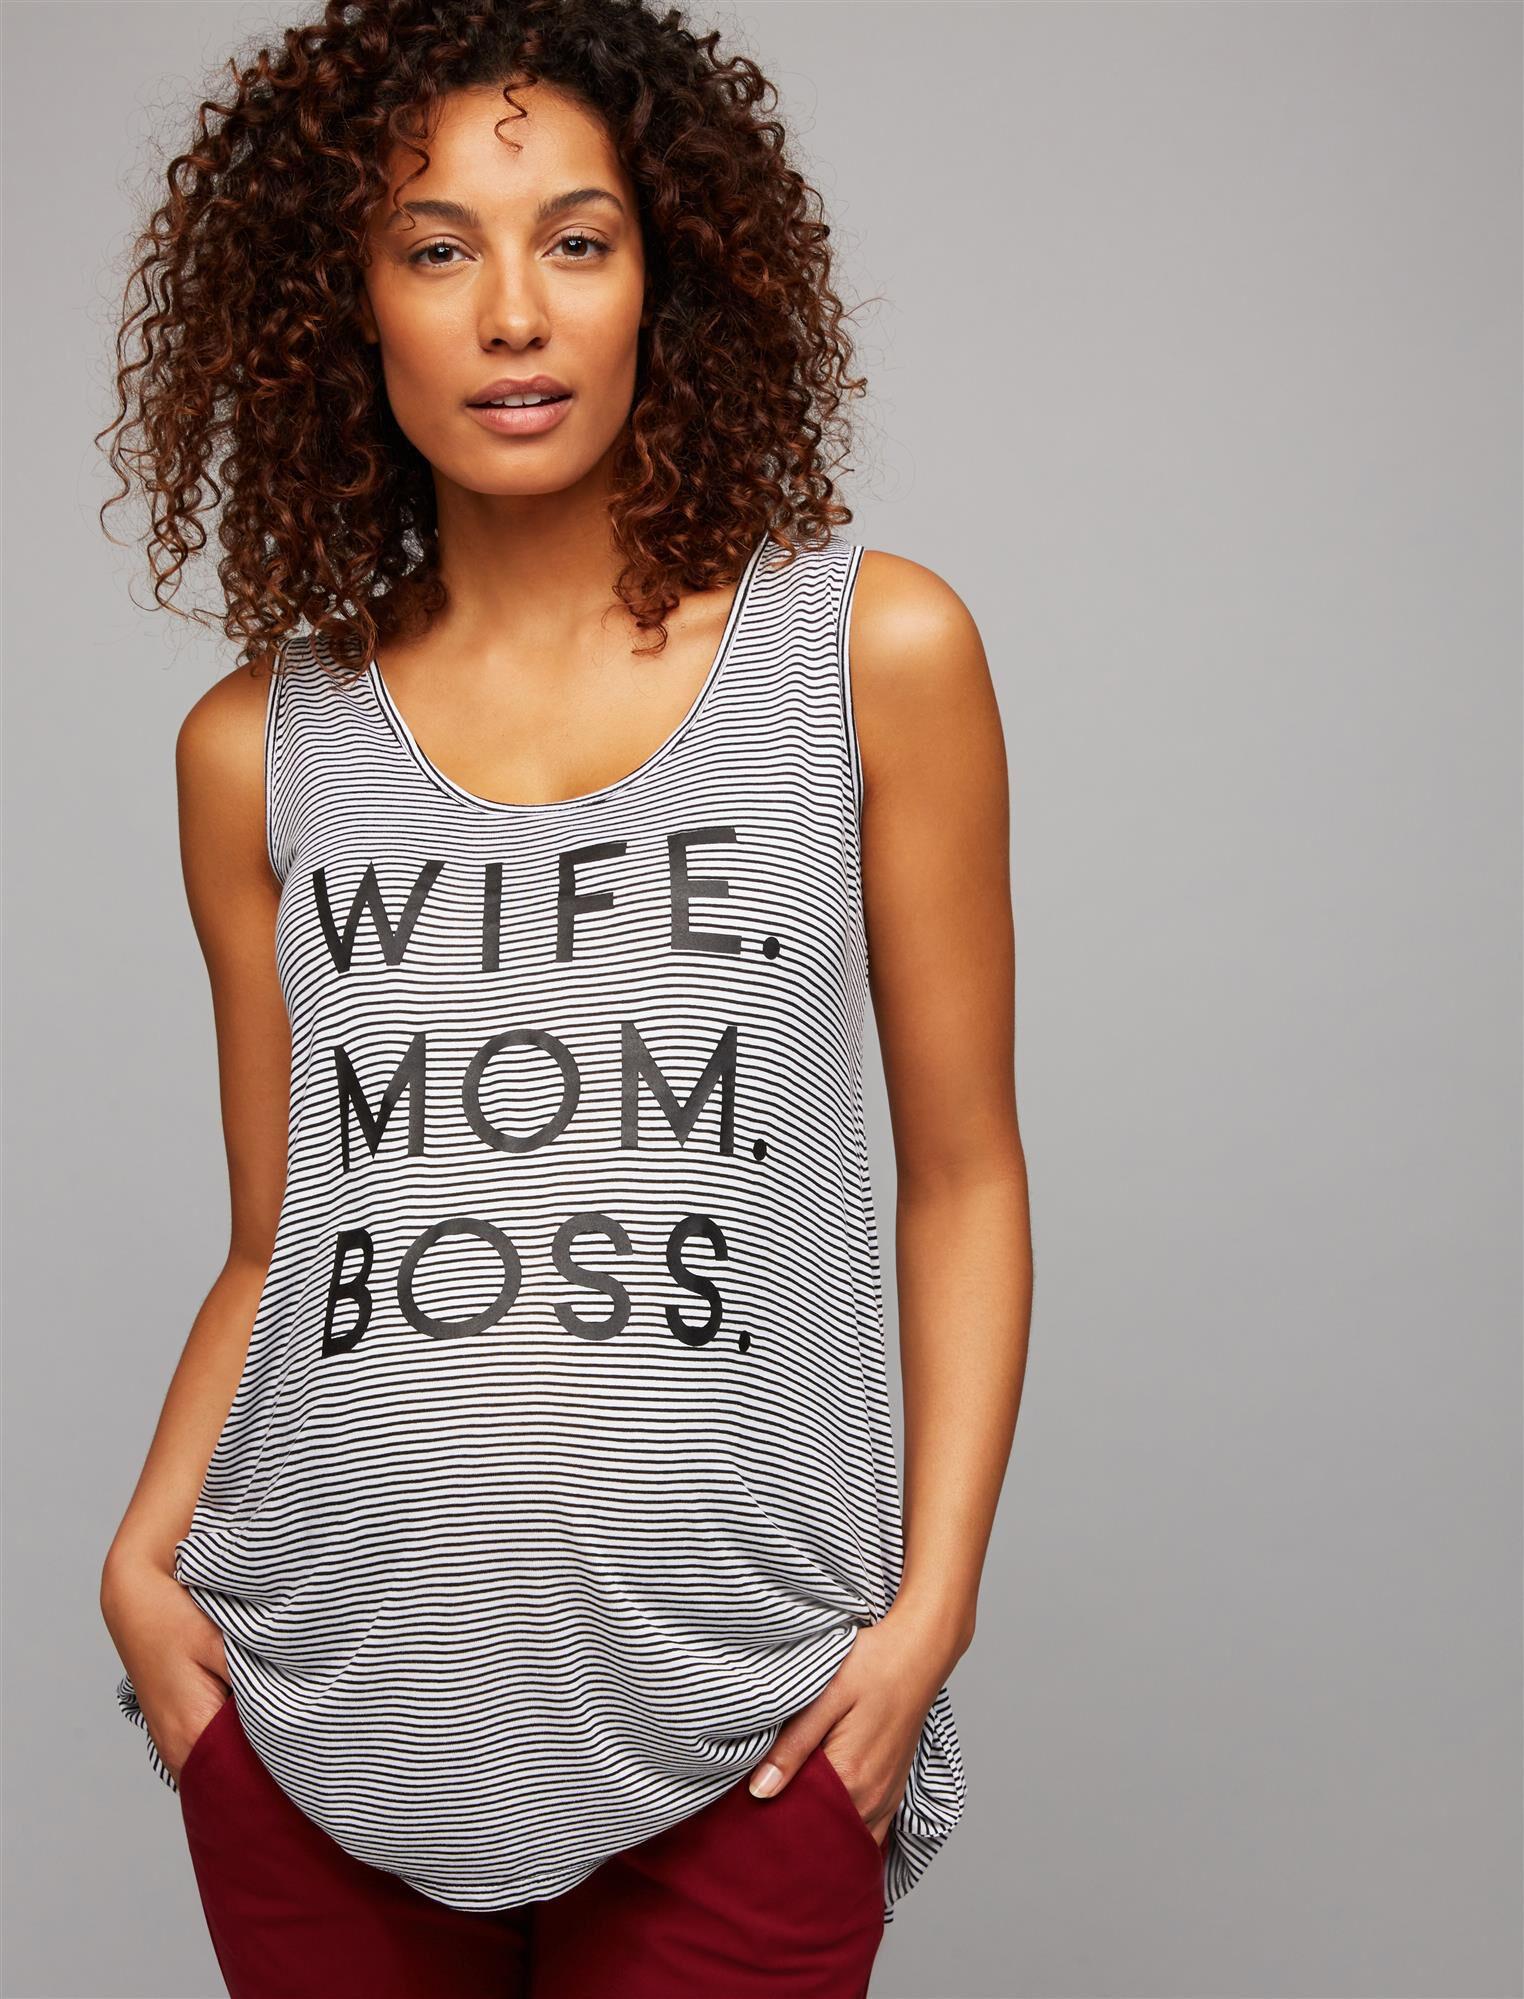 Wife. Mom. Boss. Maternity Tank